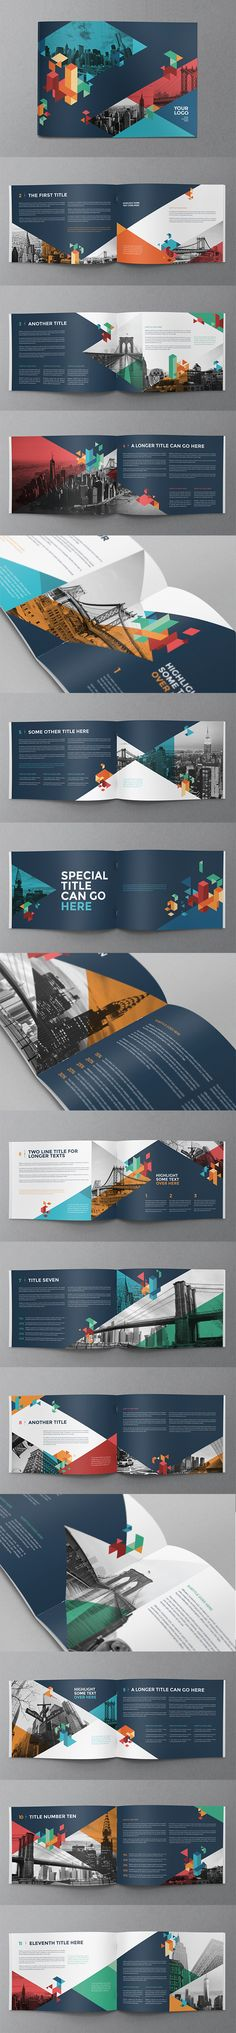 Colorful Blue Brochure. Download here: http://graphicriver.net/item/colorful-blue-brochure/10801871?ref=abradesign #brochure #design